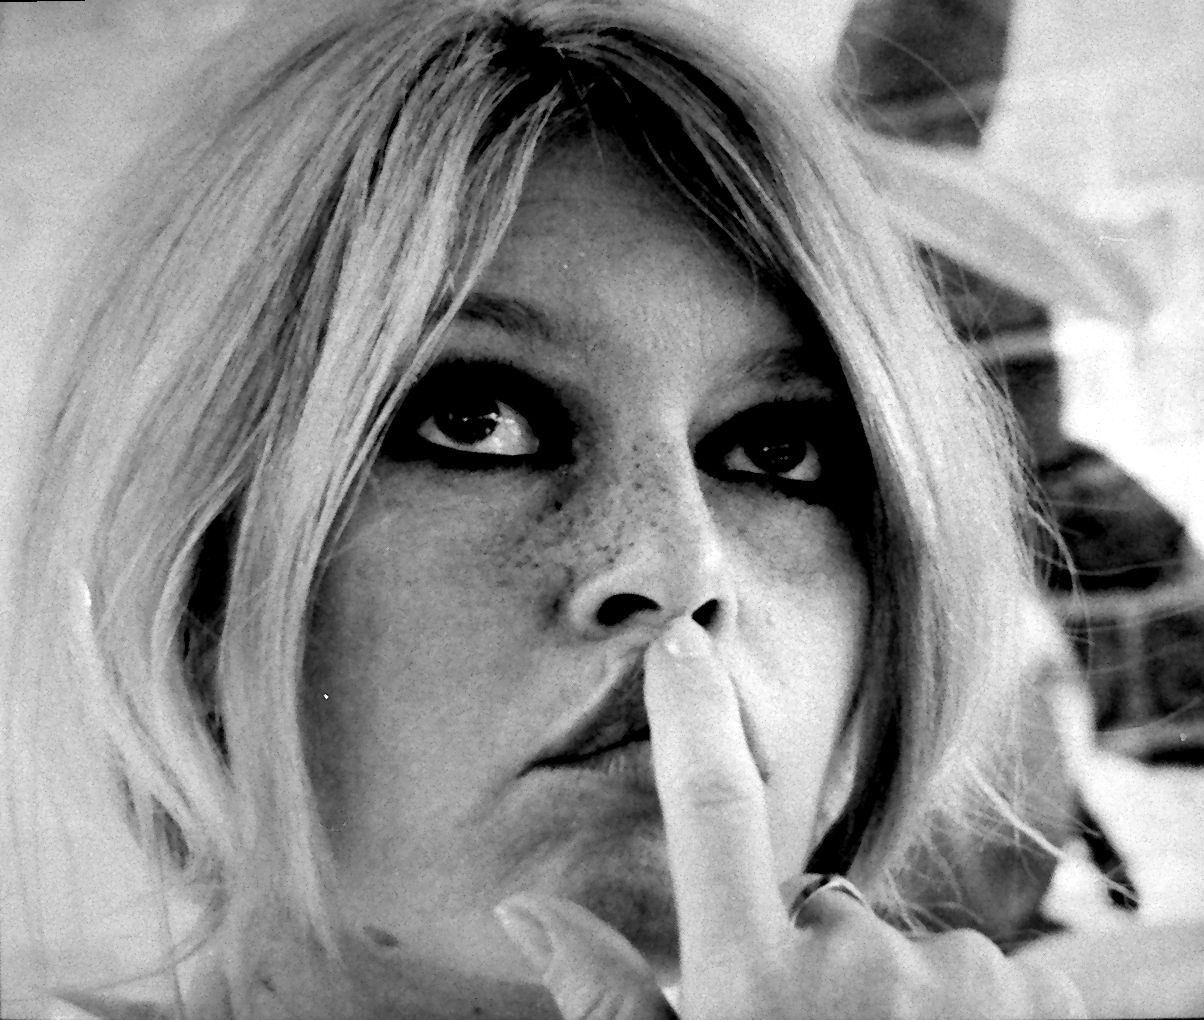 http://3.bp.blogspot.com/_e0pV4LmE4hc/TKM5lURImfI/AAAAAAAAAMw/HAUOlWYhxL8/s1600/Brigitte_Bardot.jpg